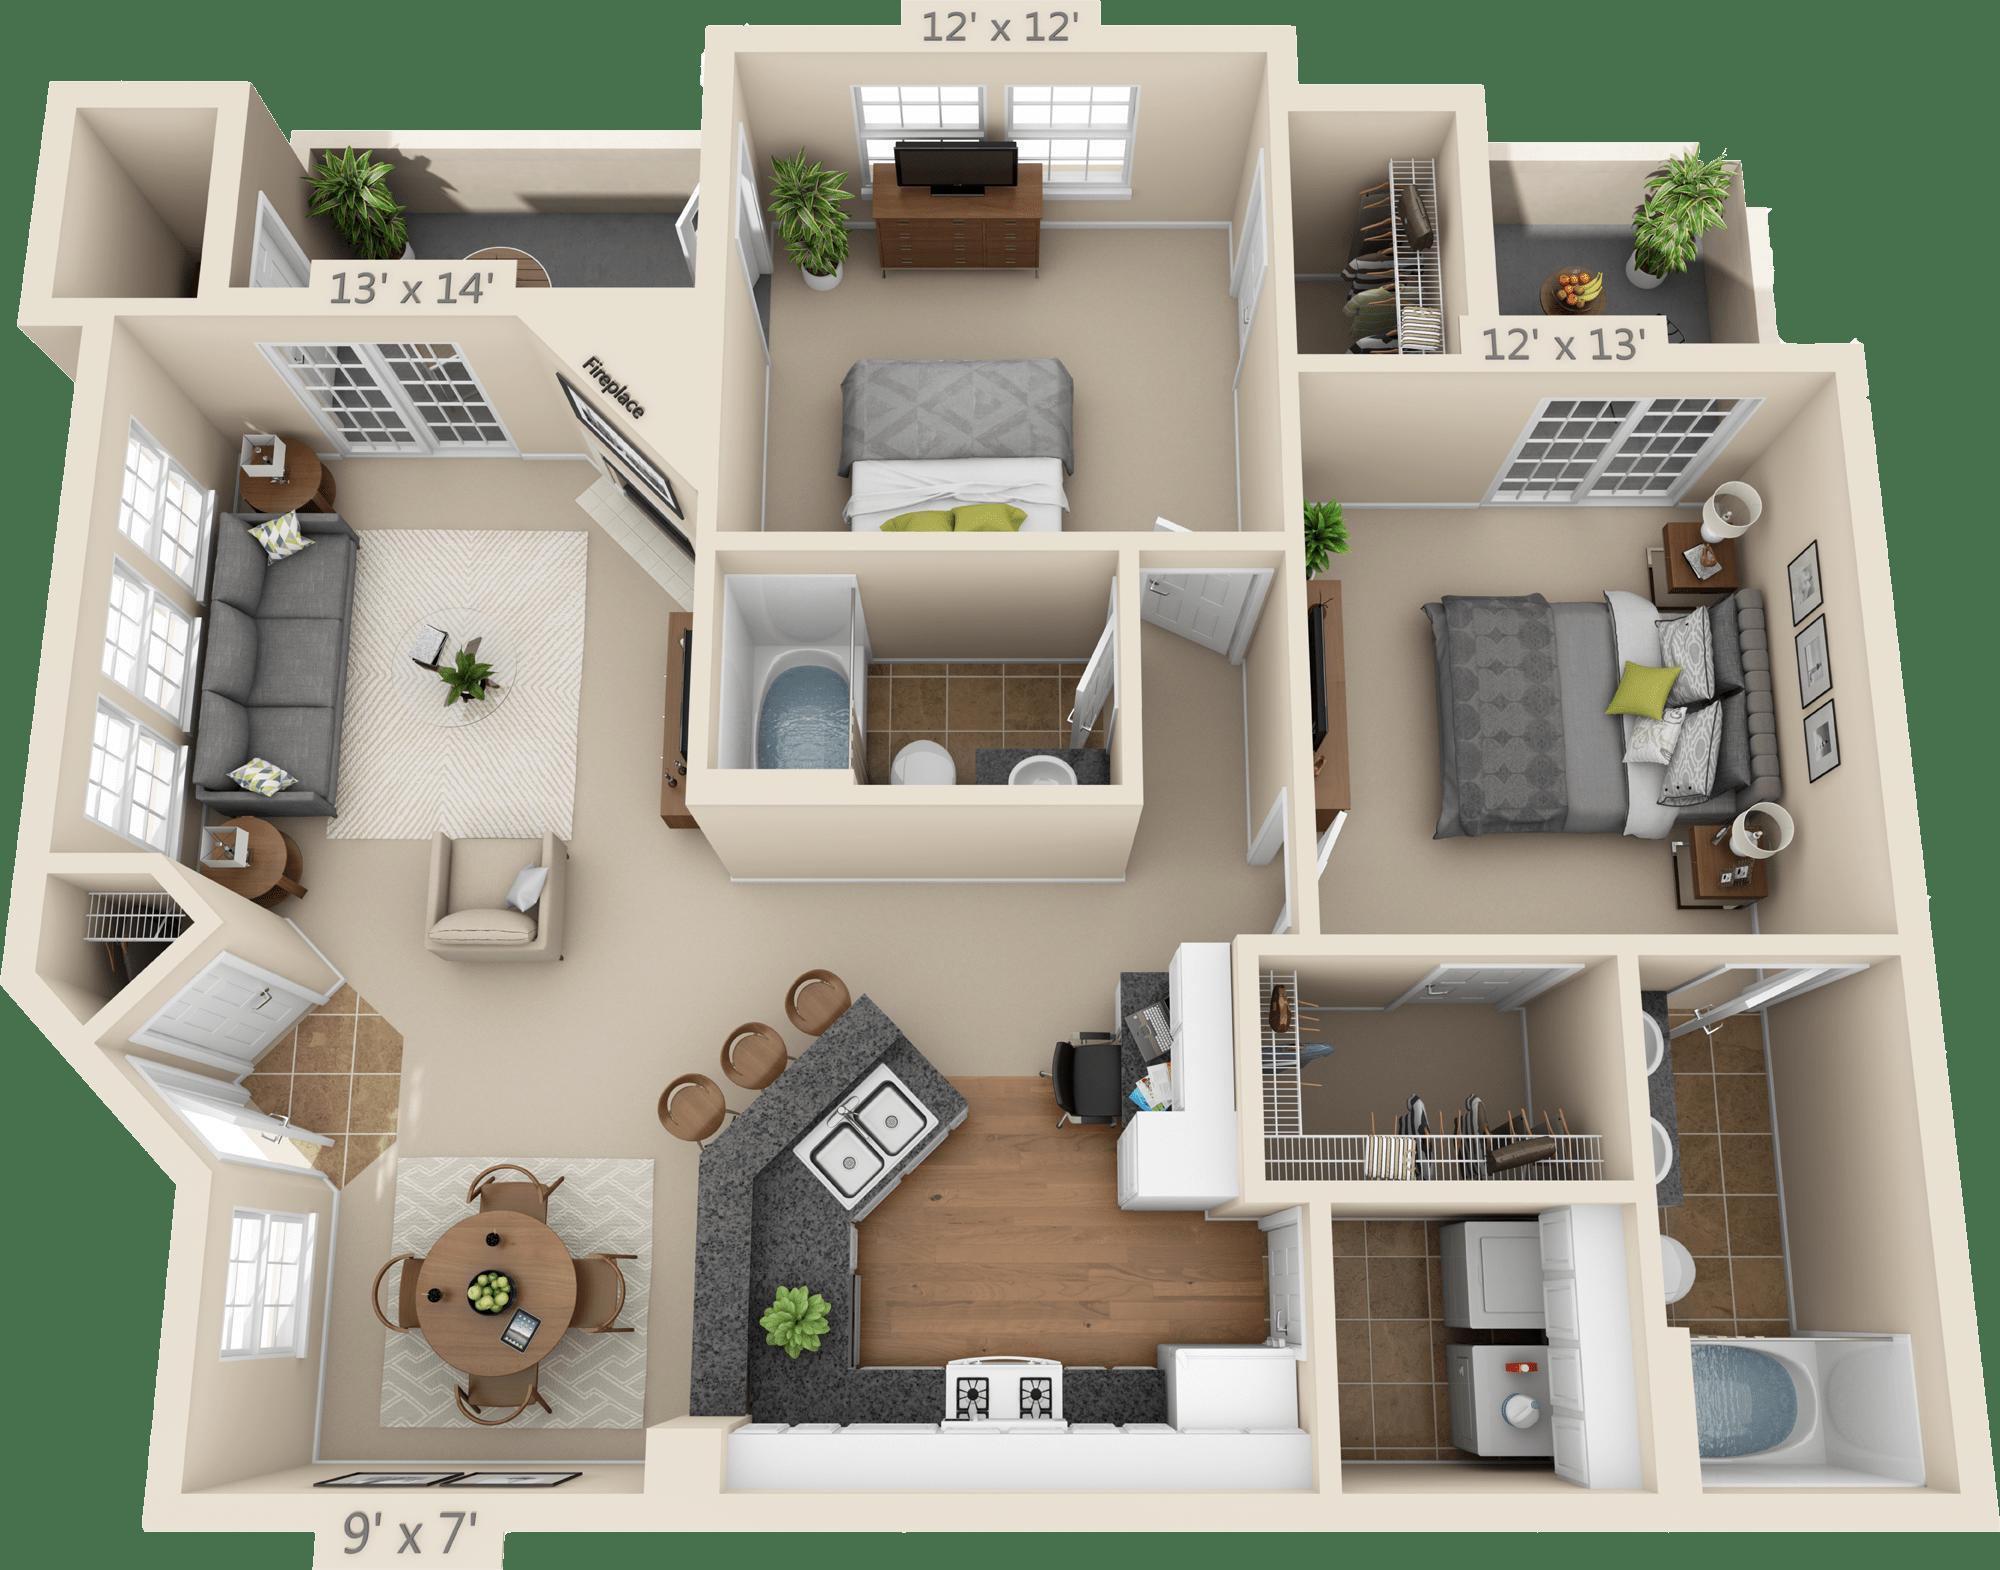 2 Bedroom Floor Plan - Rockford   Sims house plans, Studio ...